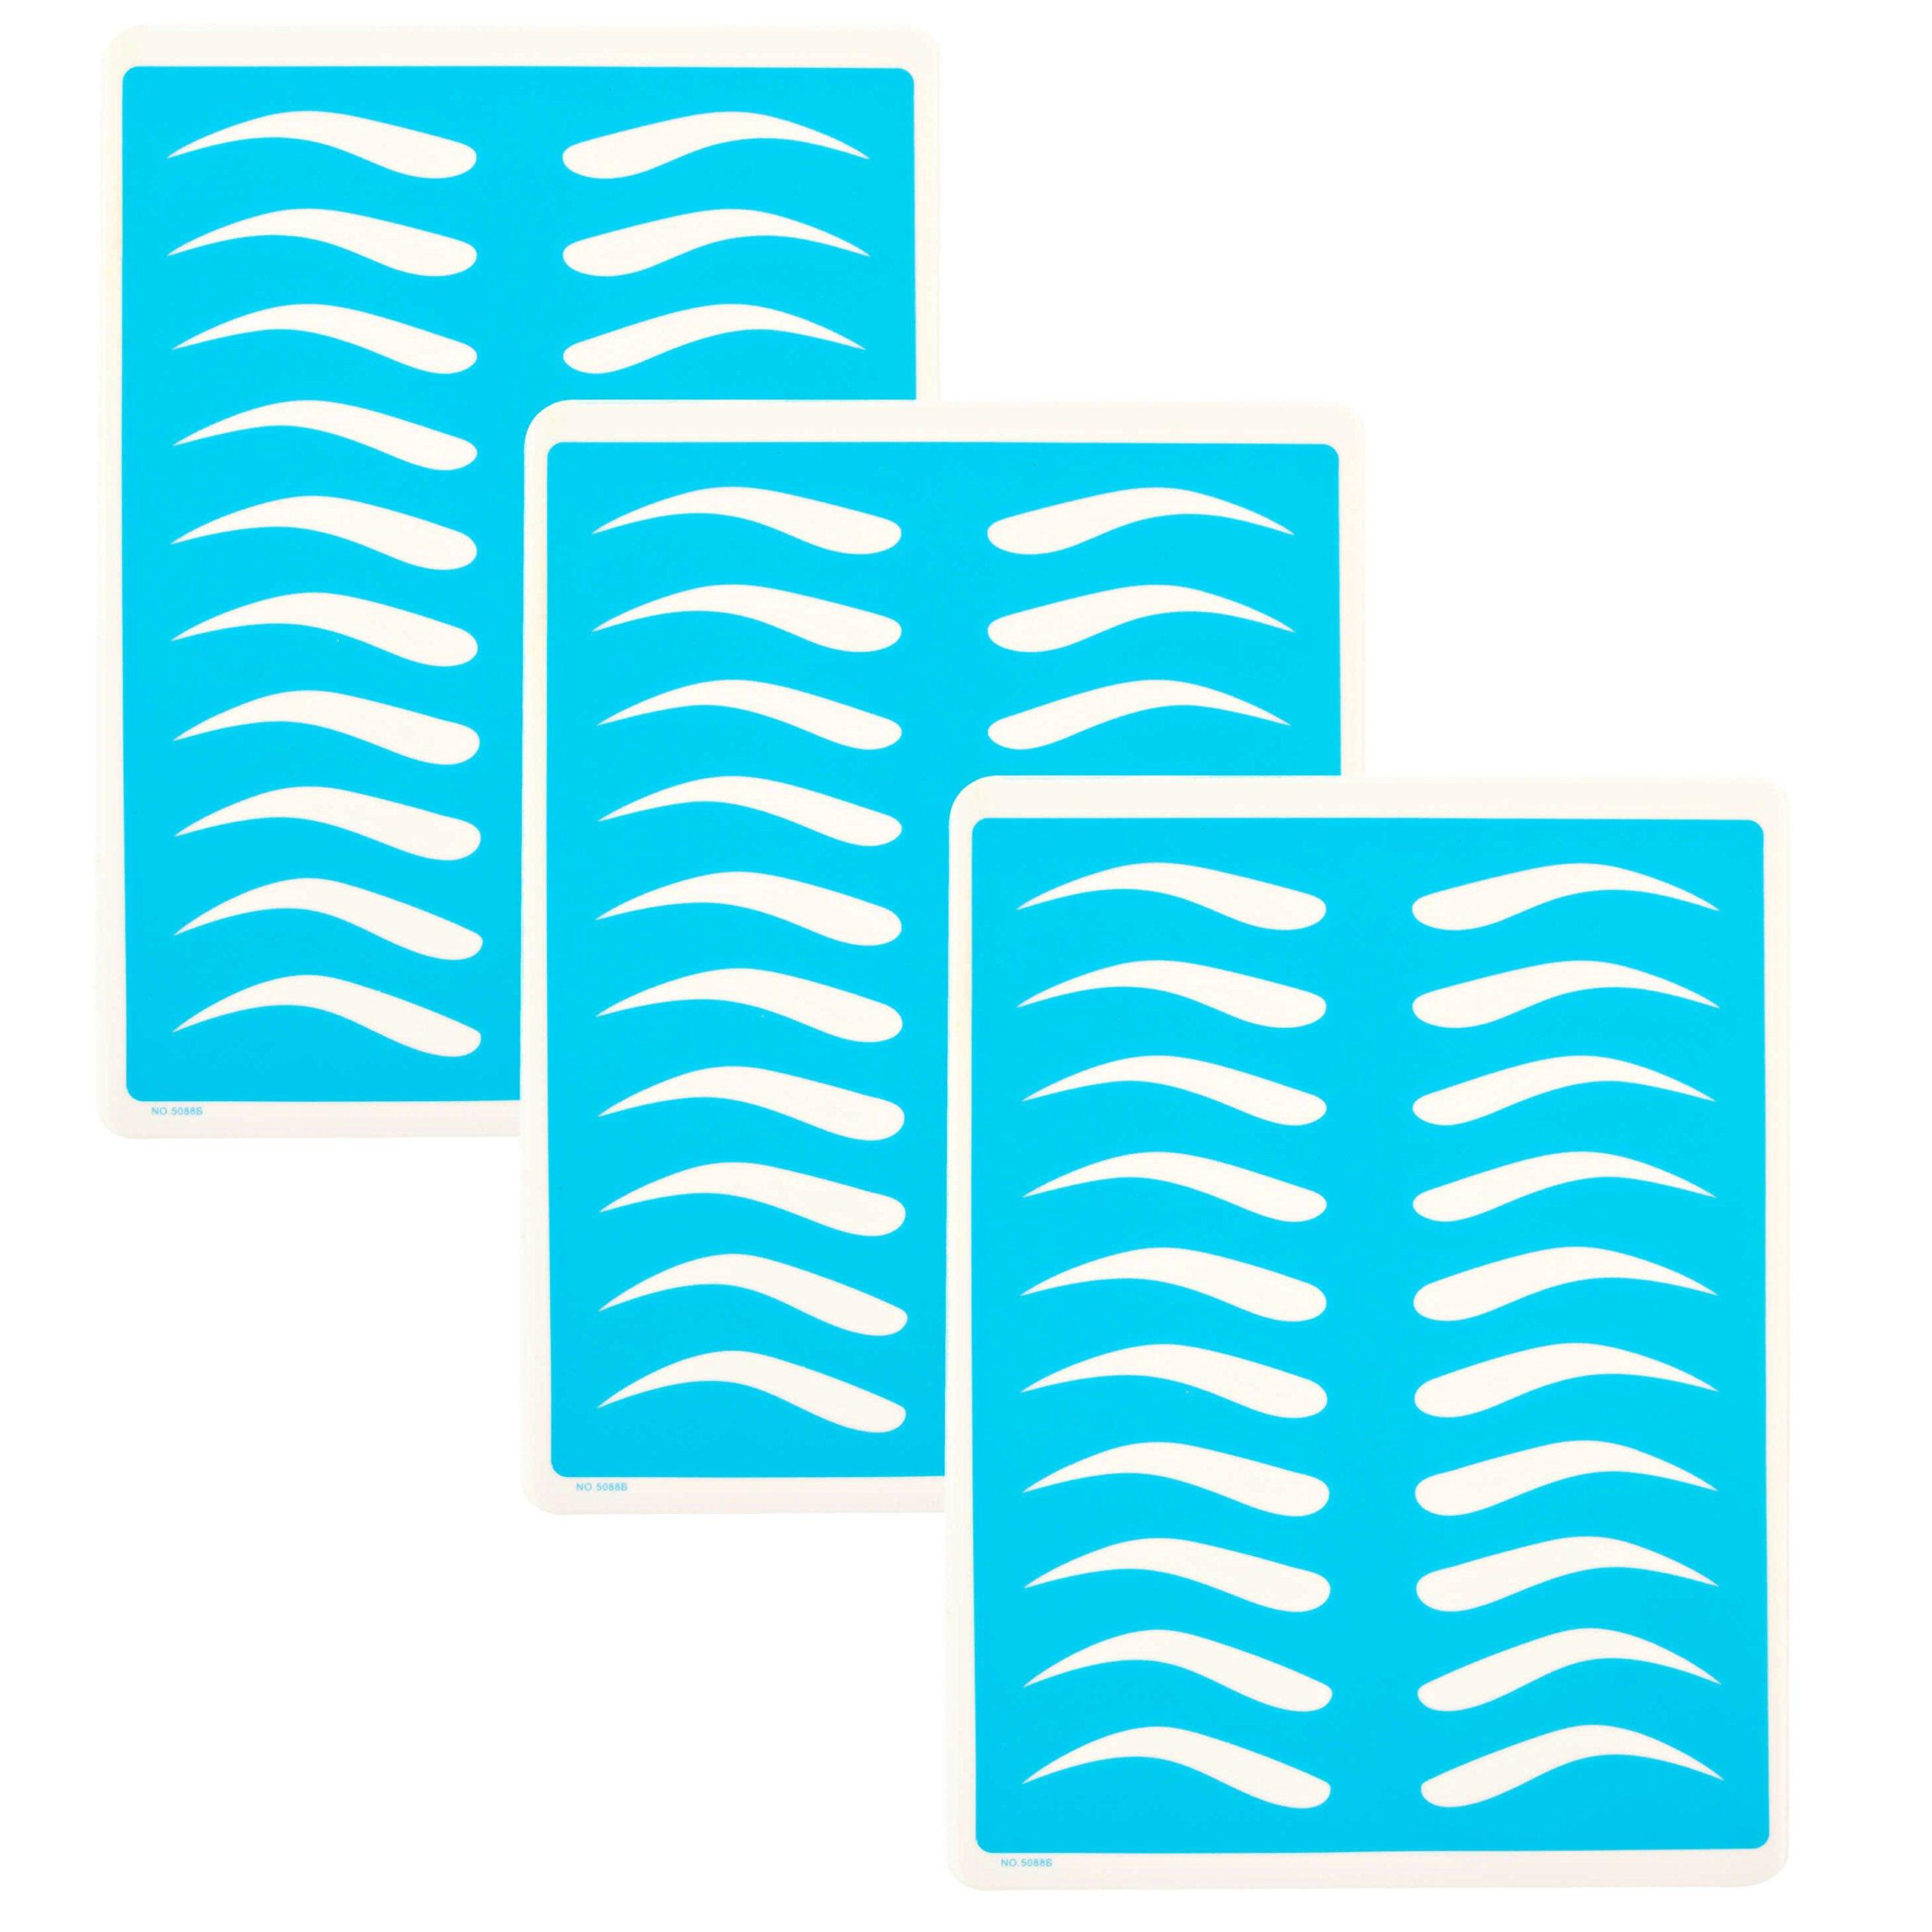 Amazon.com : Microblading Supplies 3 Piece Practice Skin For Eyebrow ...